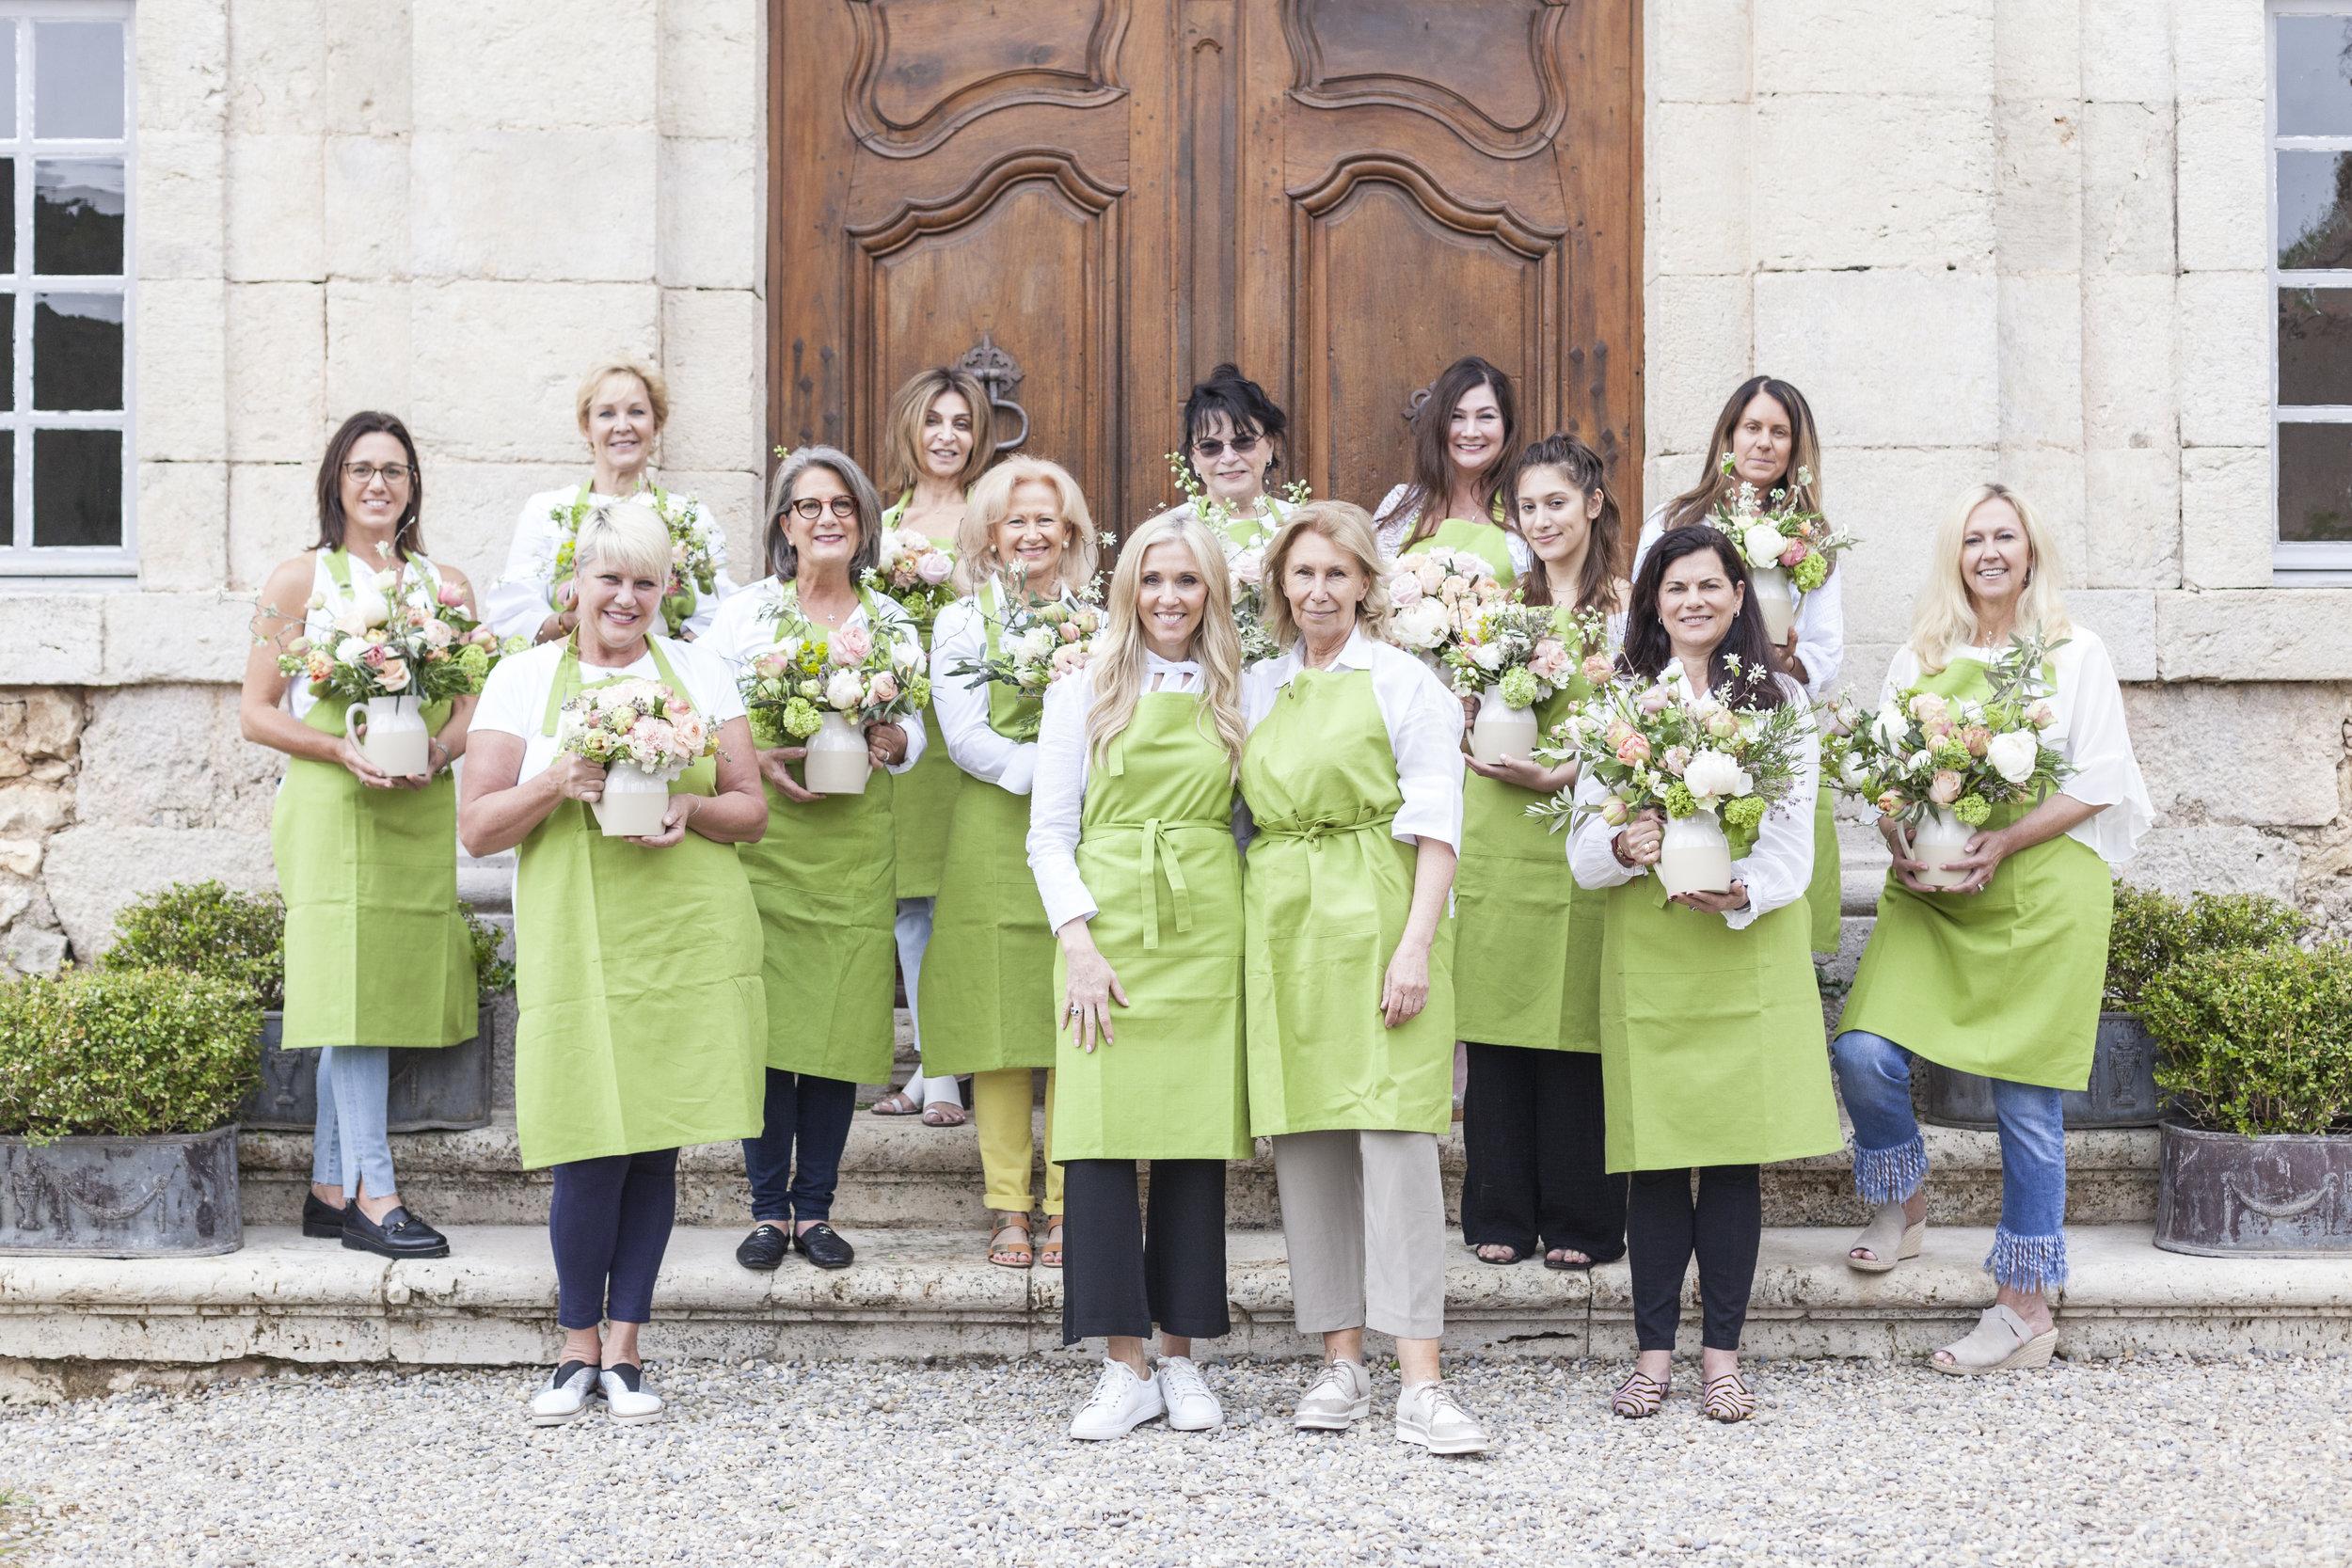 flower workshop provence france french flower design sandra sigman sharon santoni les fleurs my french country home